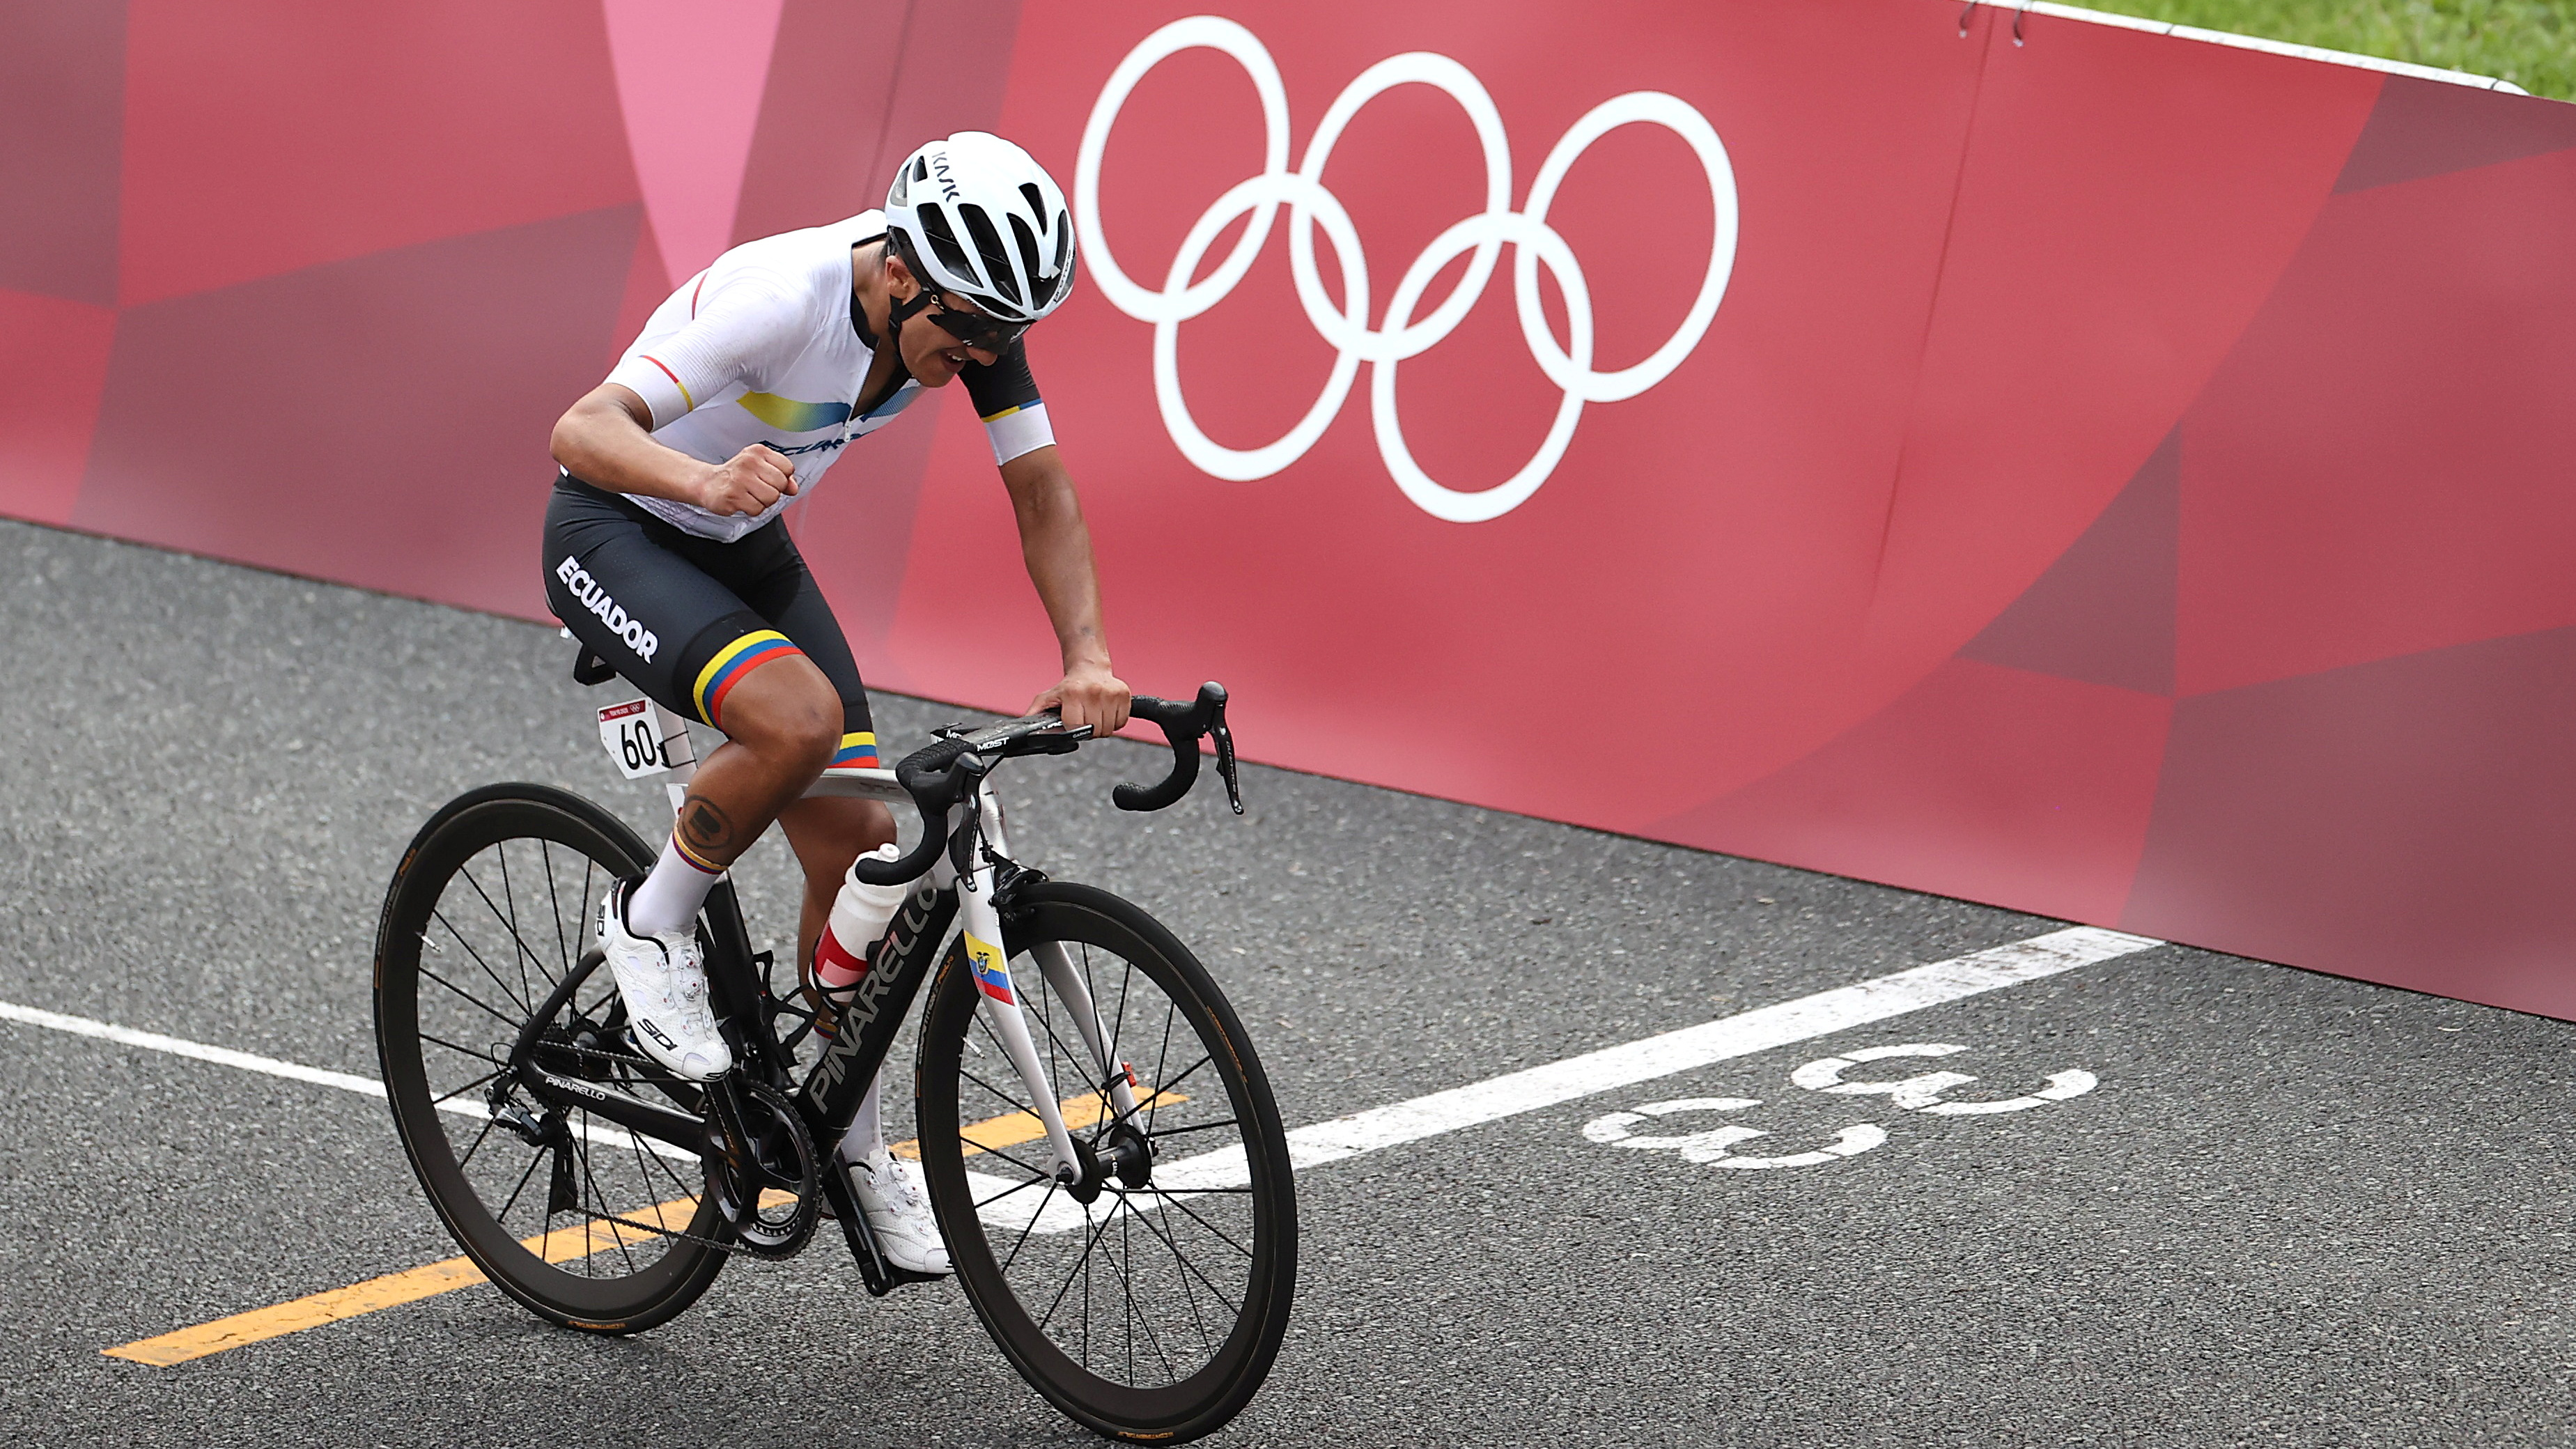 Tokyo 2020 Olympics - Cycling - Road - Men's Road Race - Final - Tokyo to Fuji International Speedway, Japan - July 24, 2021. Richard Carapaz of Ecuador celebrates winning gold. REUTERS/Christian Hartmann